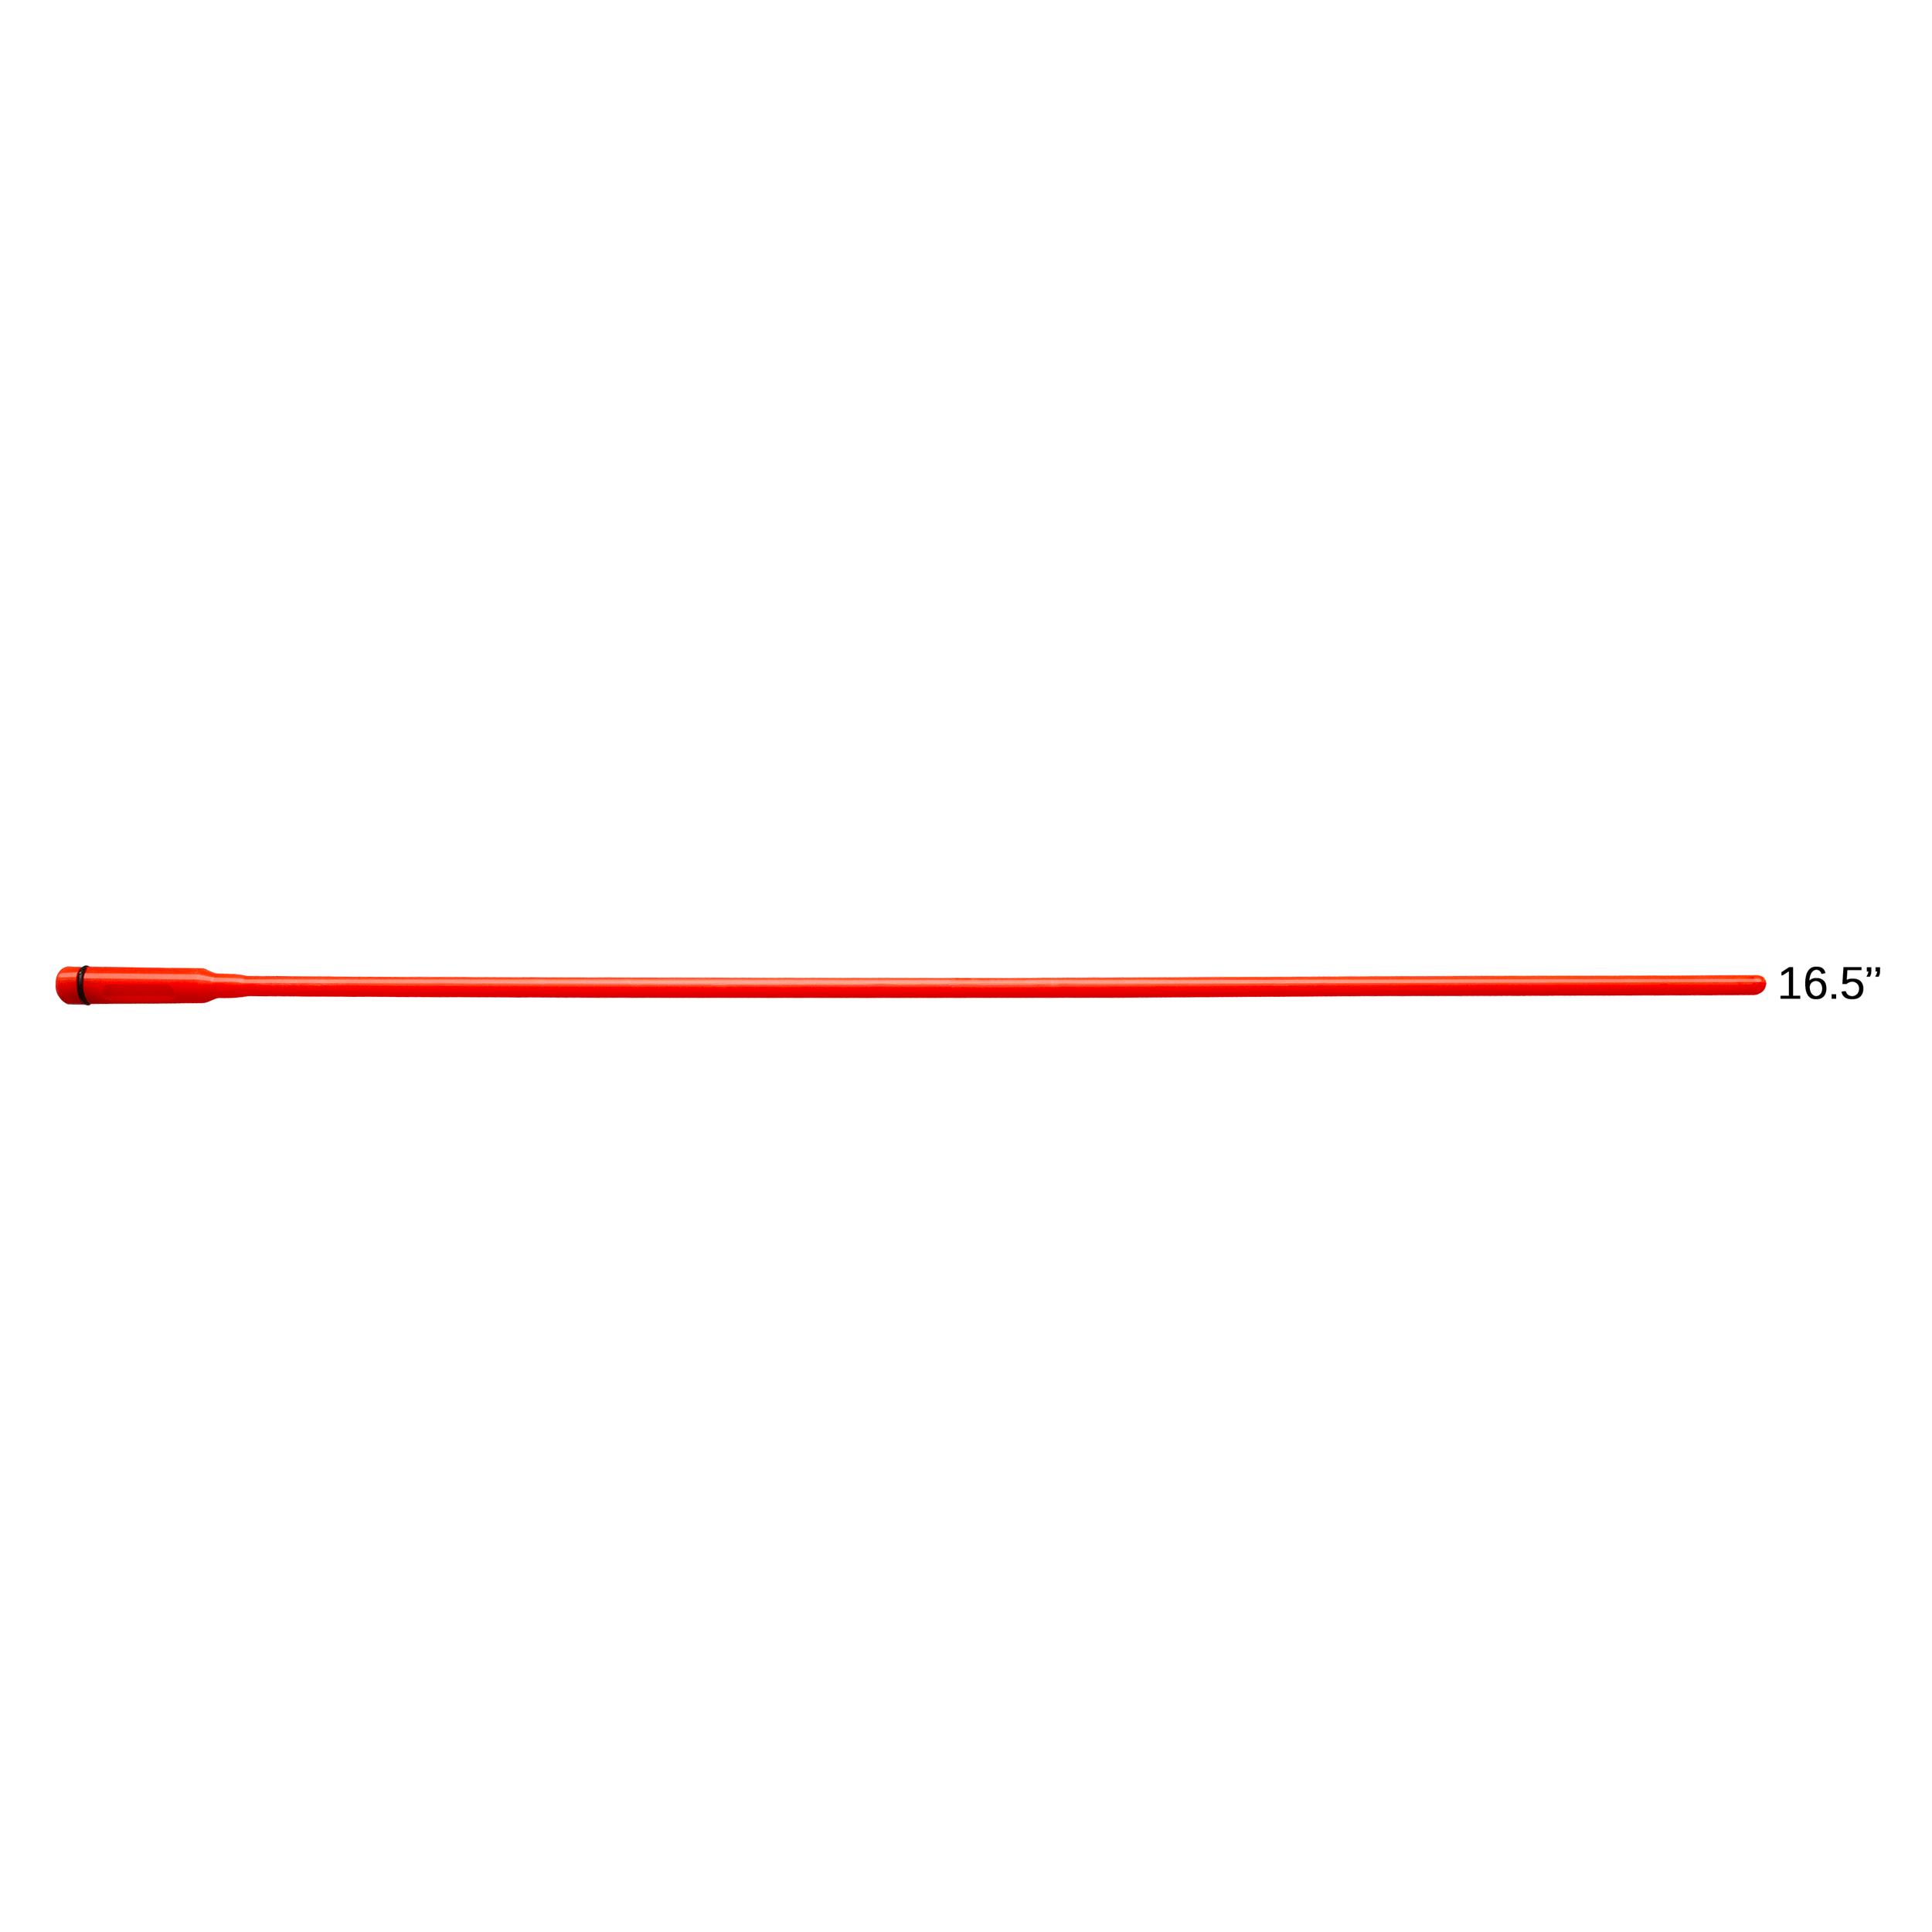 "Safety Rod 5.56 x 45 / .223 REM  up to 16.5"" / 425mm length ( carbine )"